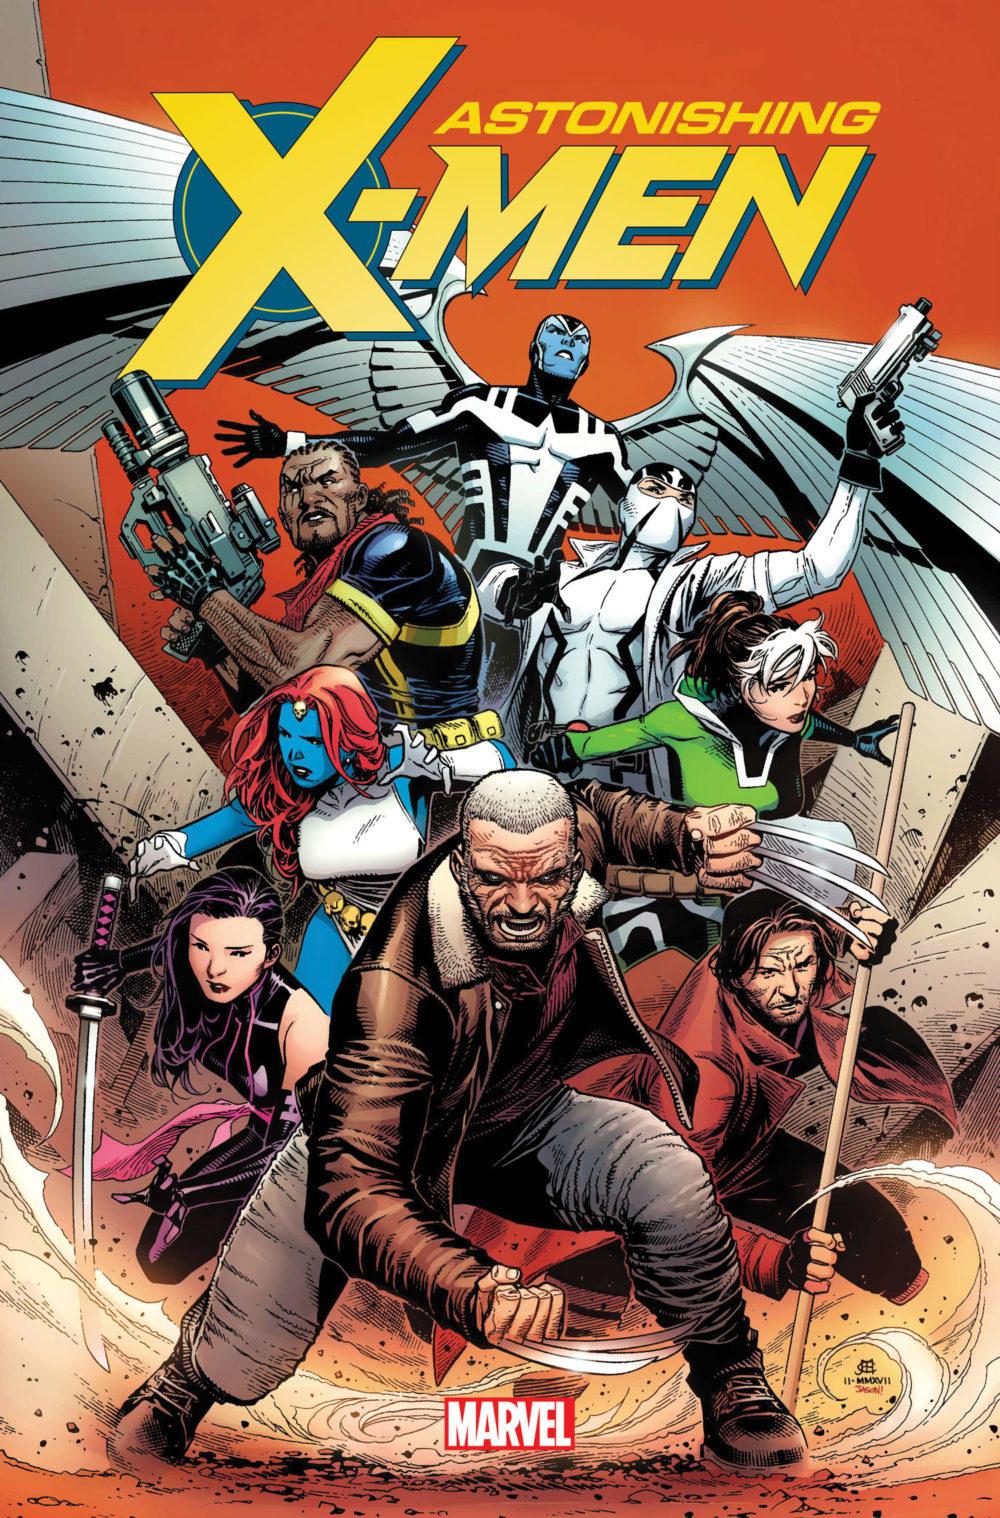 ASTONISHING X-MEN #1 Recruits Superstar Writer Charles Soule!